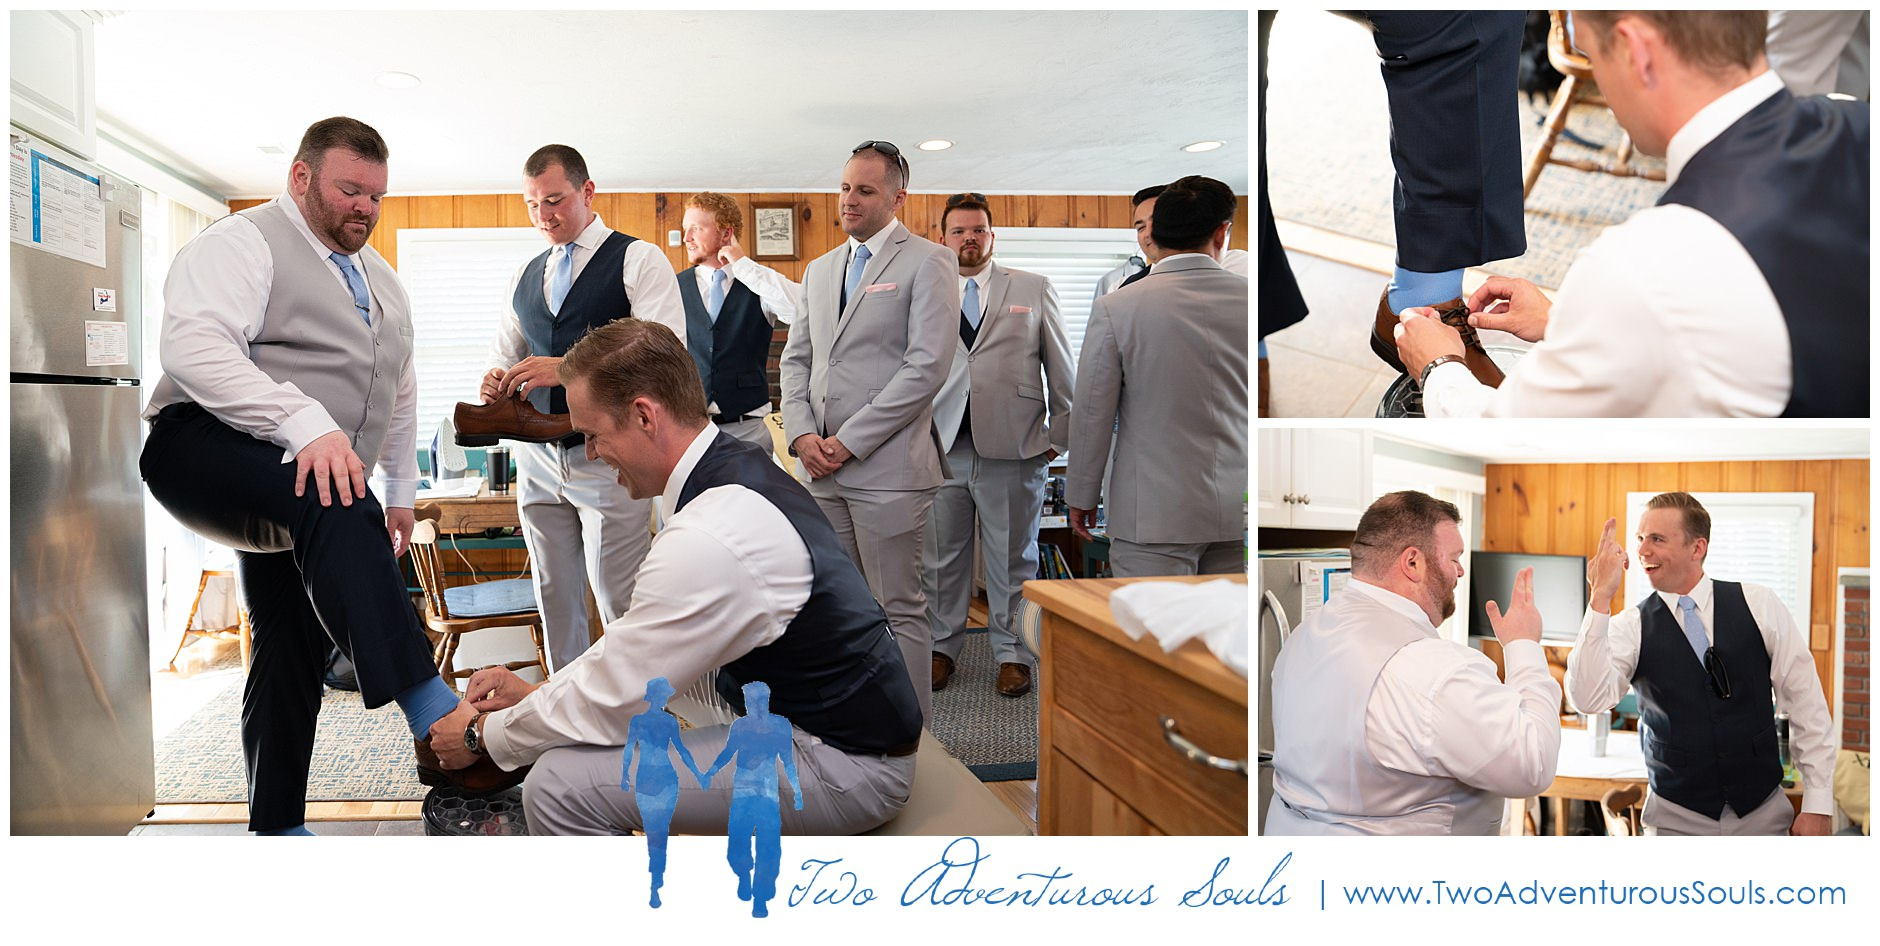 Cape Cod Wedding Photographers, Destination Wedding Photographers, Two Adventurous Souls-081019_0005.jpg